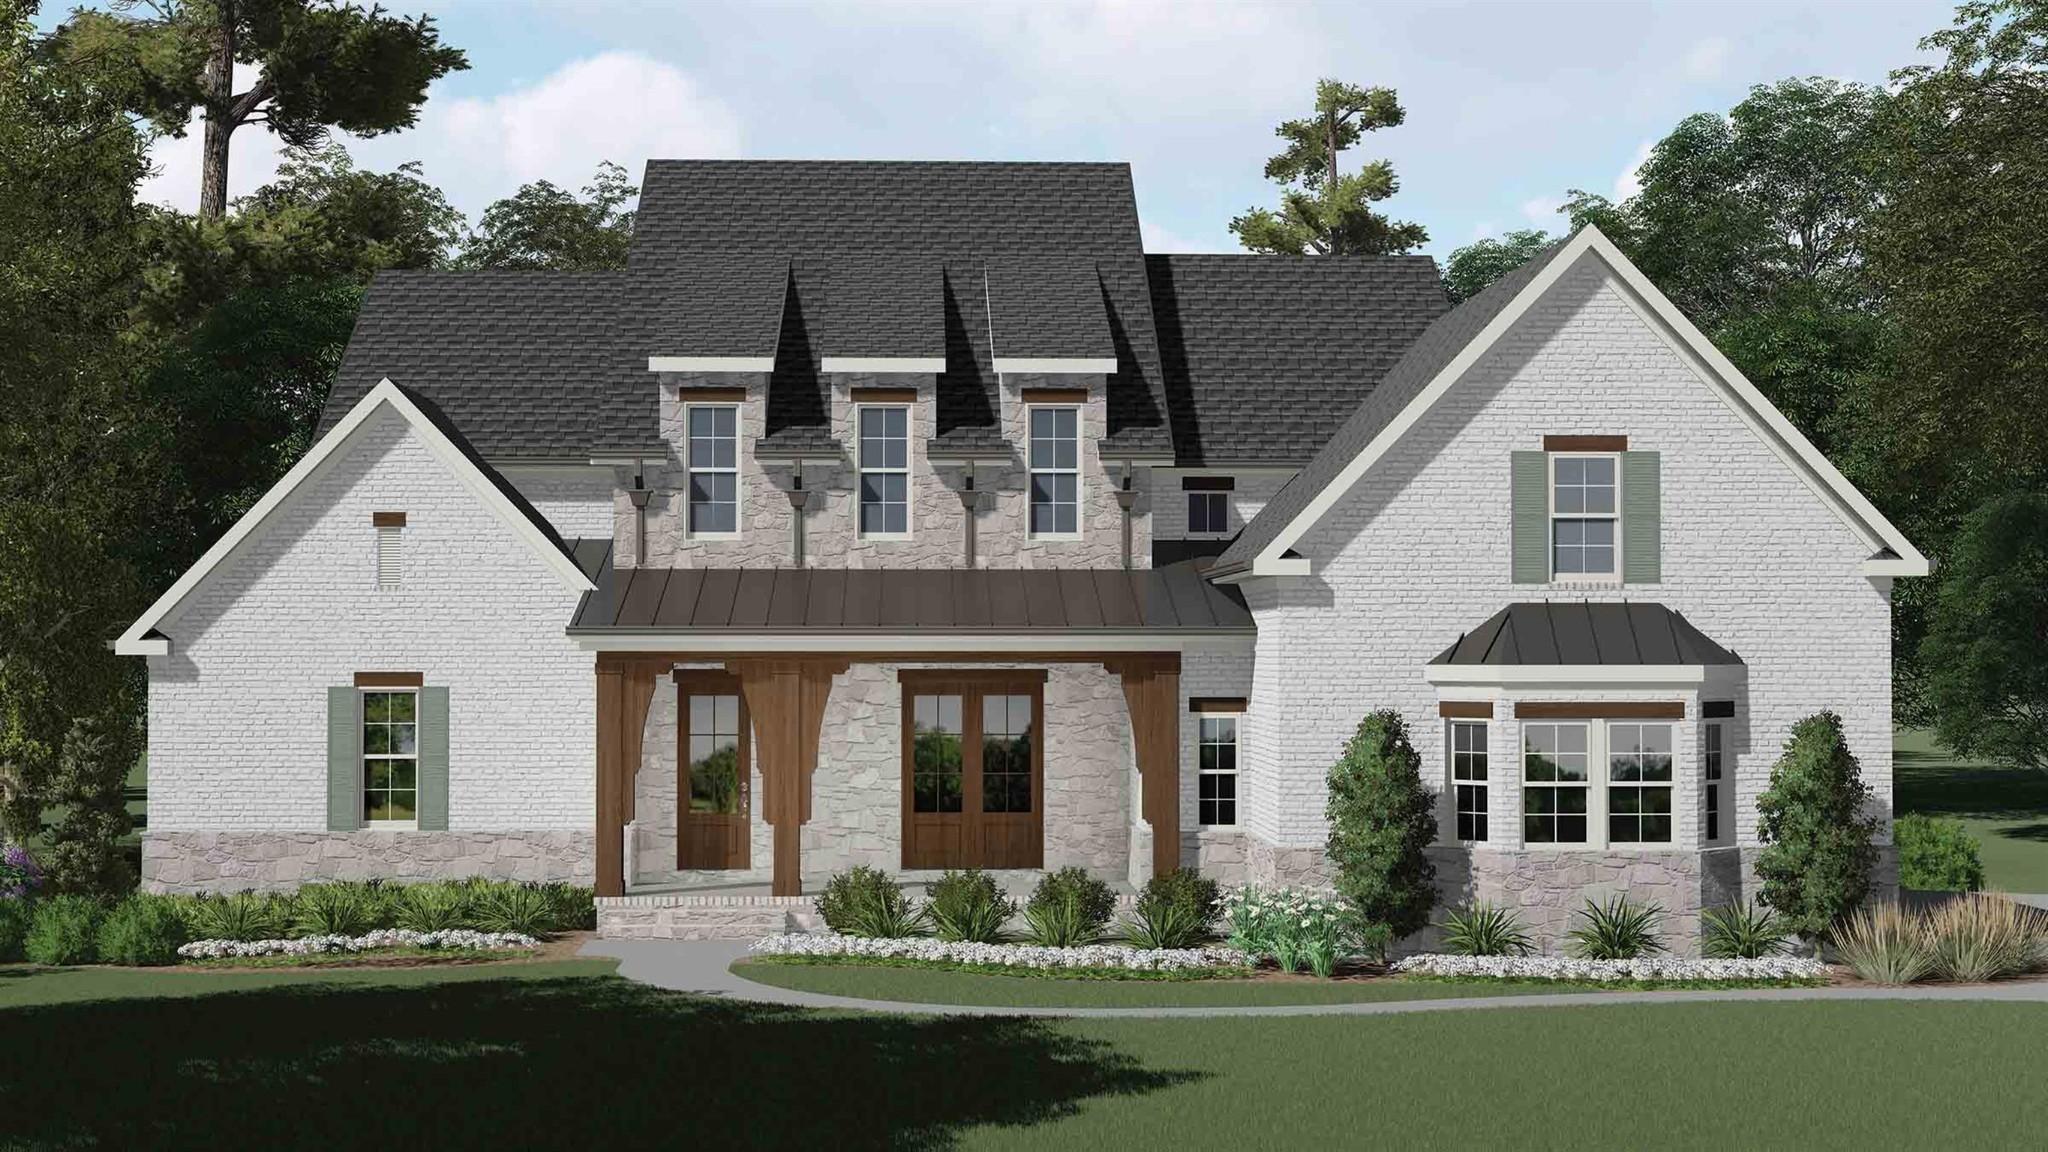 1018 Albatross Property Photo - Gallatin, TN real estate listing